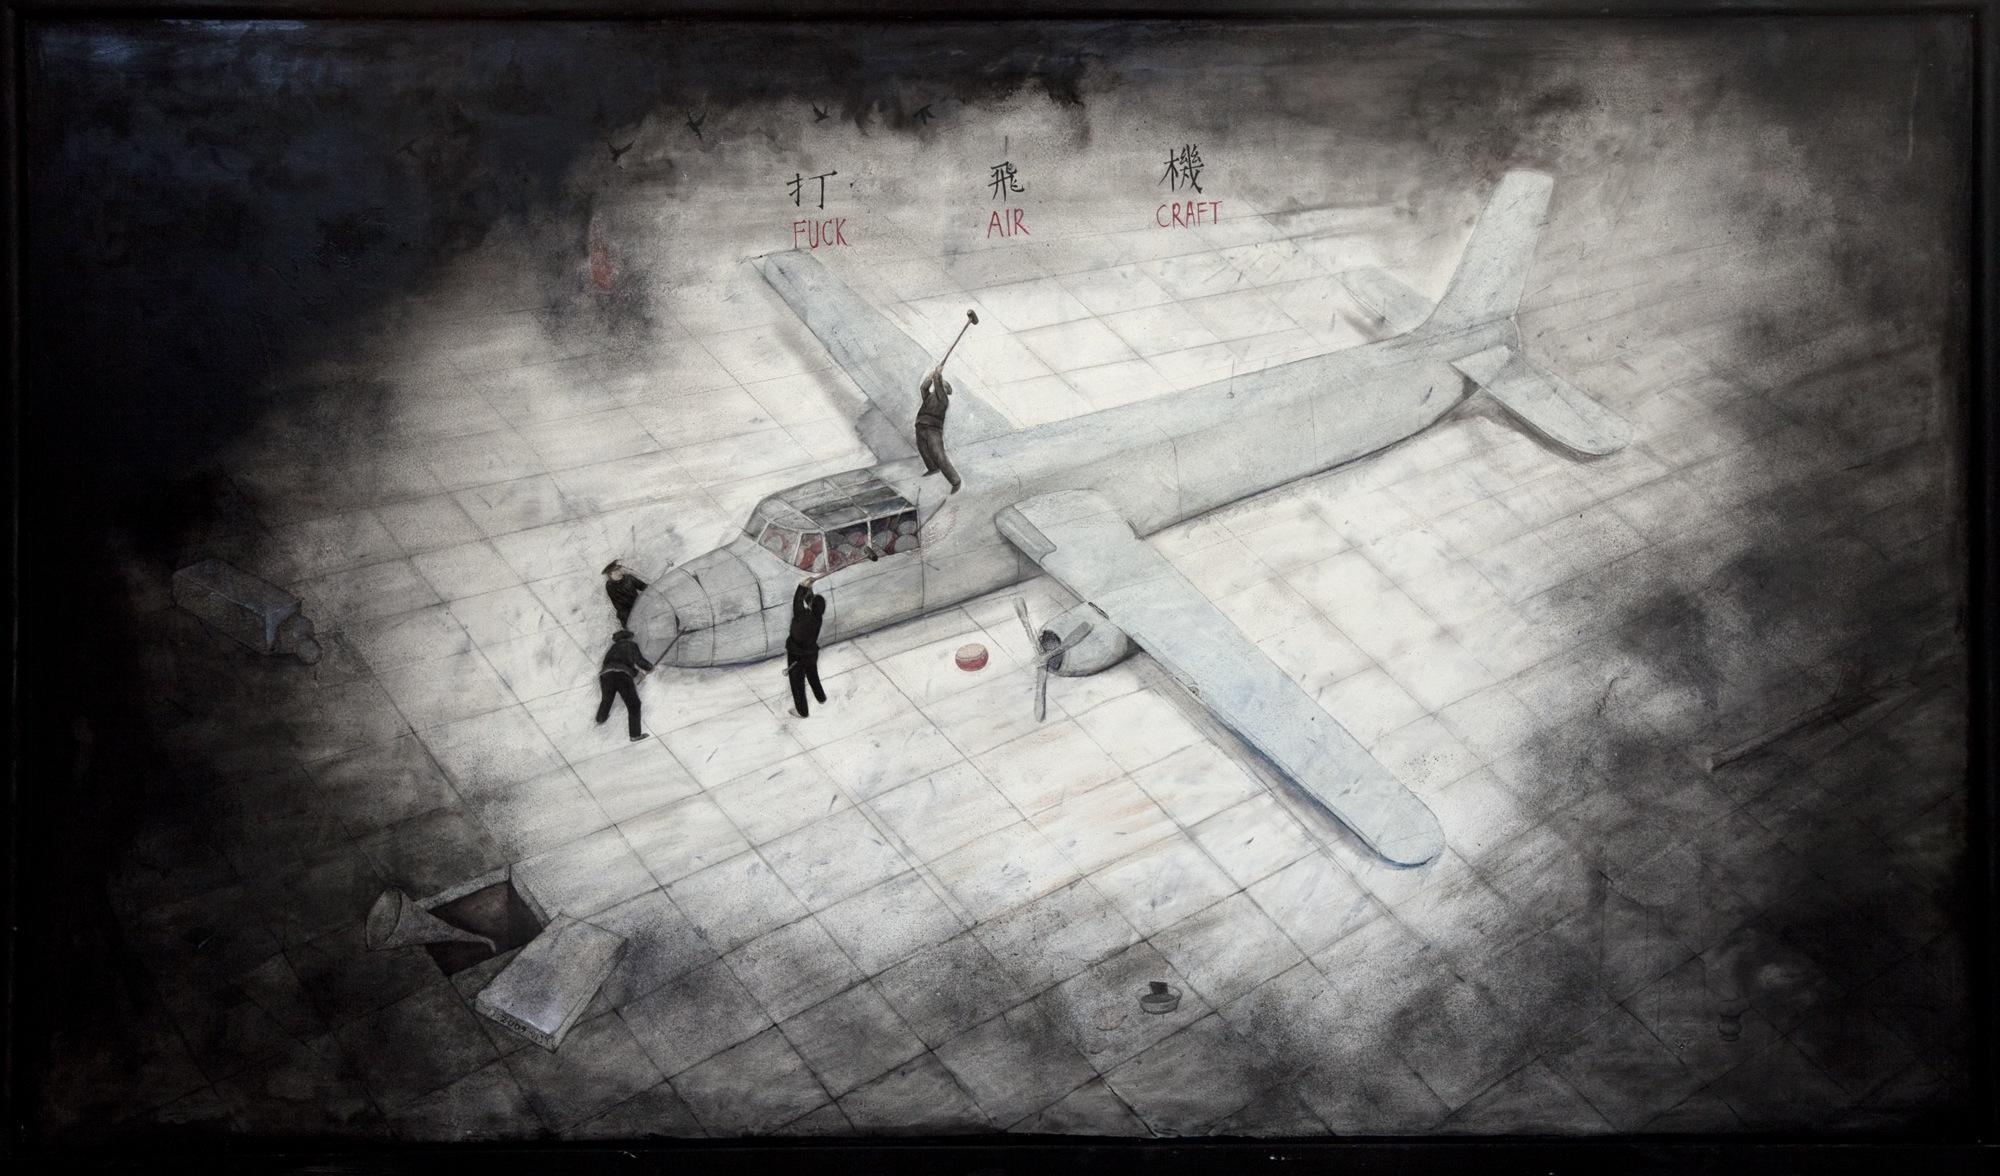 Wu Junyong 吴俊勇, Fuck Air Craft 打飞机, 2009, Mixed media on blackboard 黑板综合材料, 120 x 200 cm